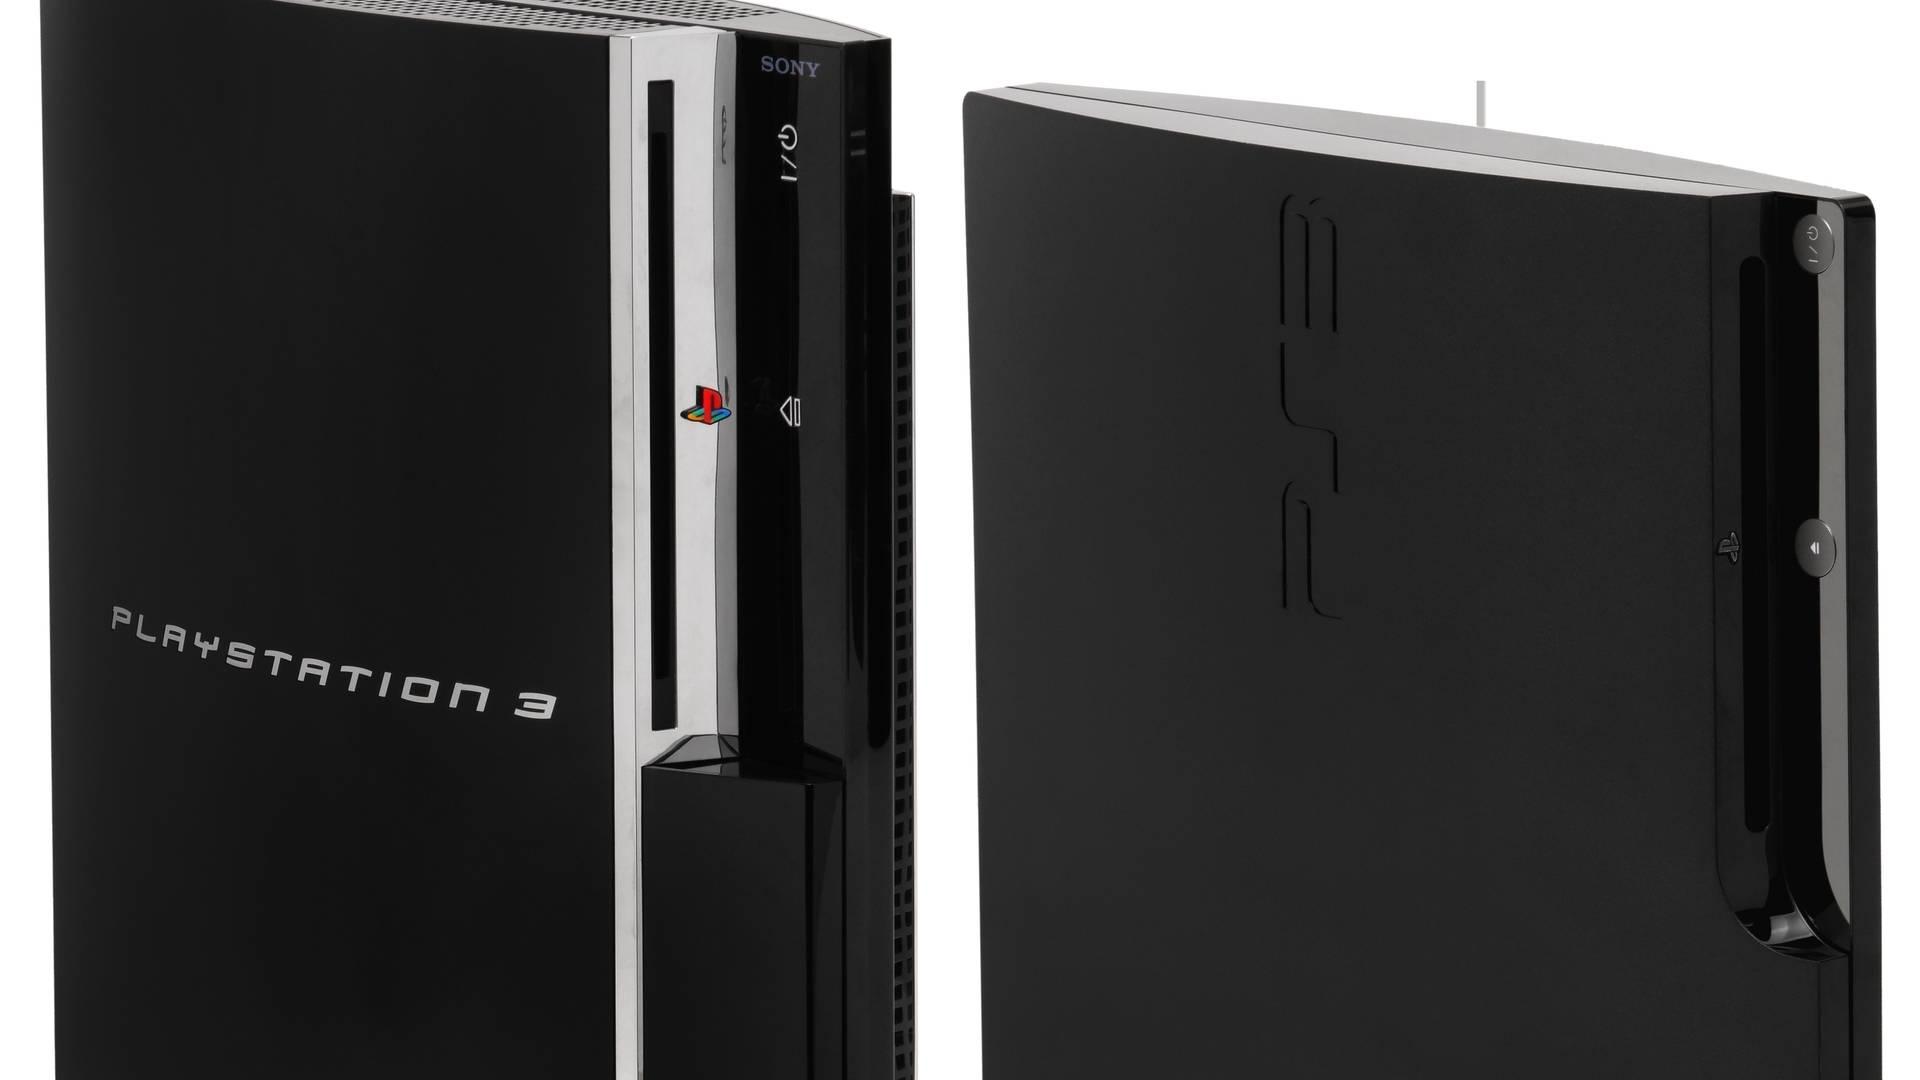 PlayStation 3, PS3 Slim, PS3 Fat